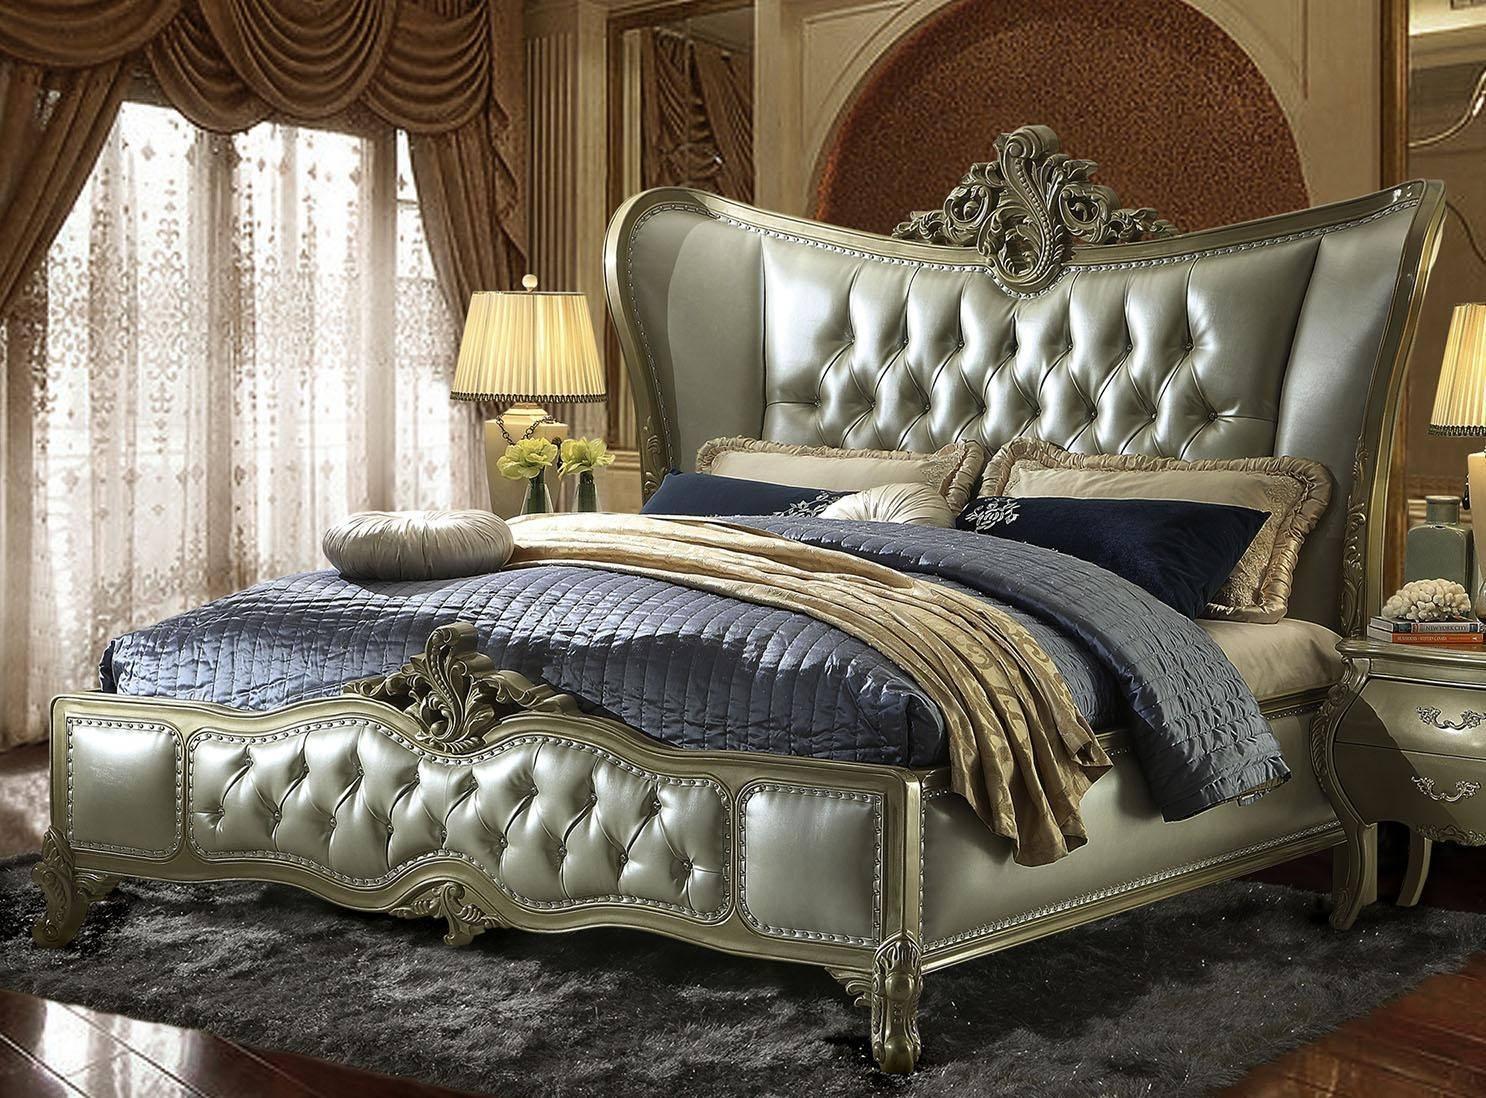 royal bedroom sets - HD1486×1098